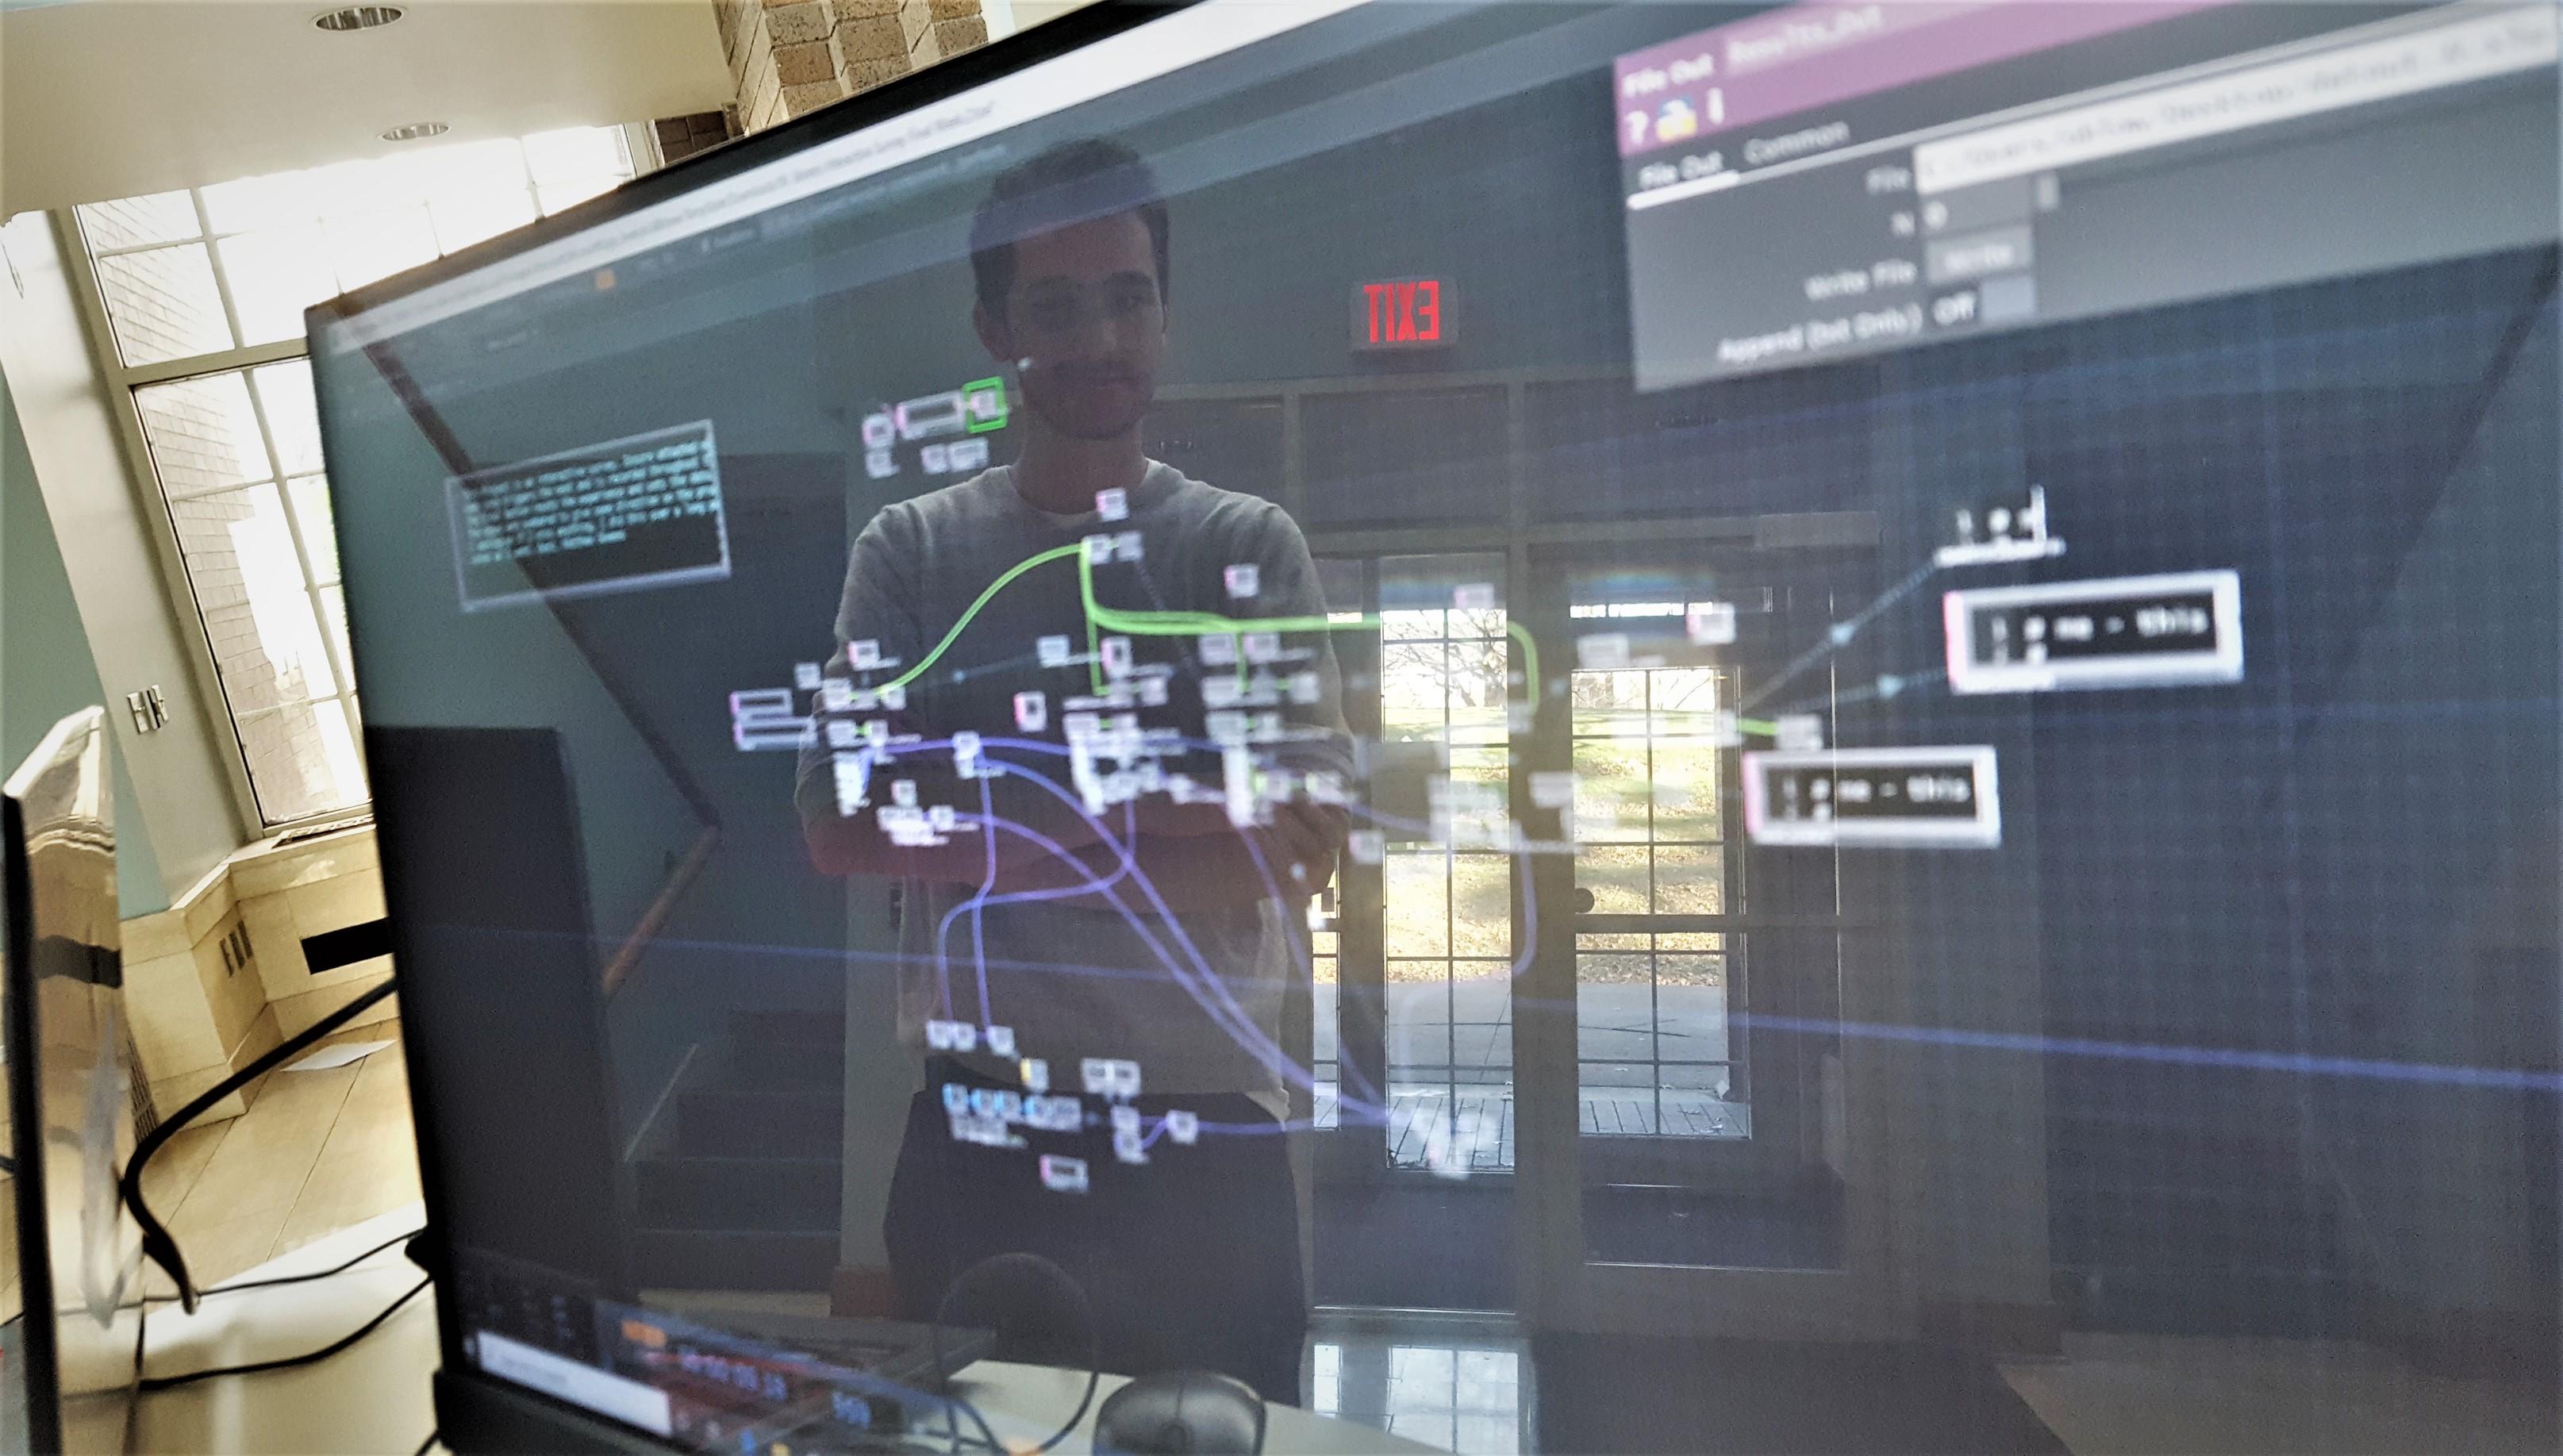 interactivesurvey_touchnetwork.jpg